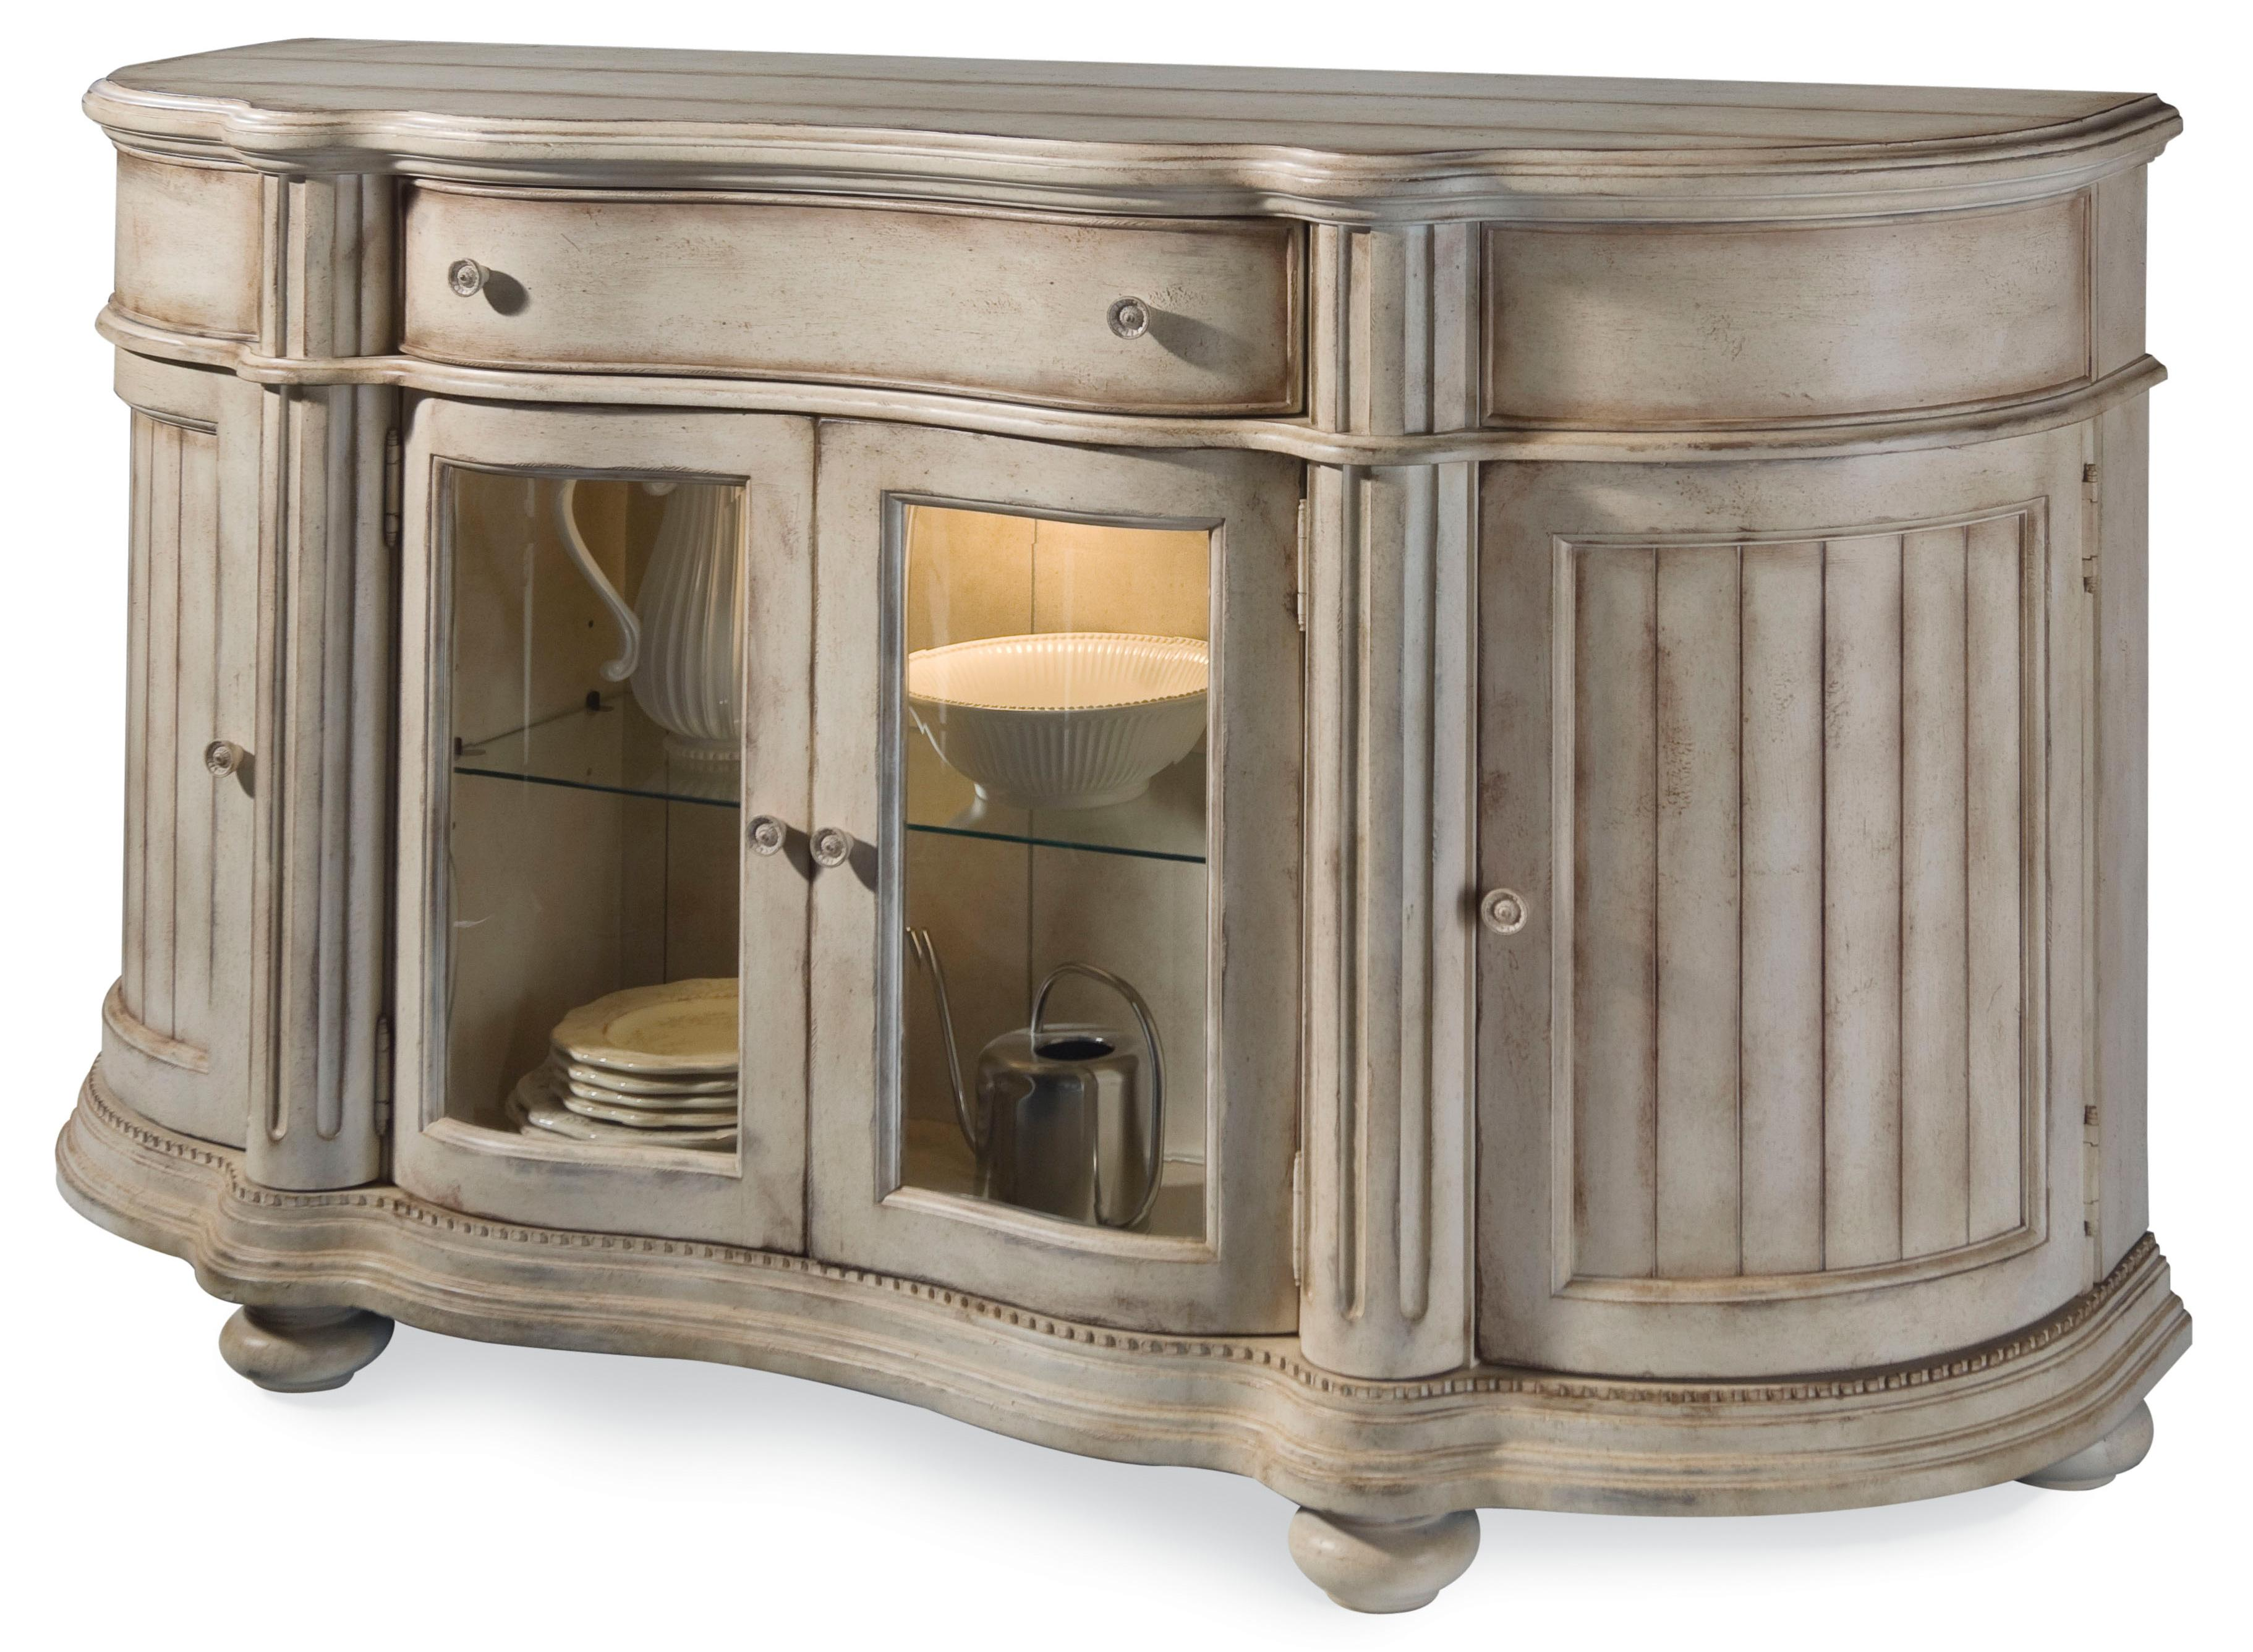 Superbe A.R.T. Furniture Inc Belmar II Sideboard   Item Number: 189251 2617